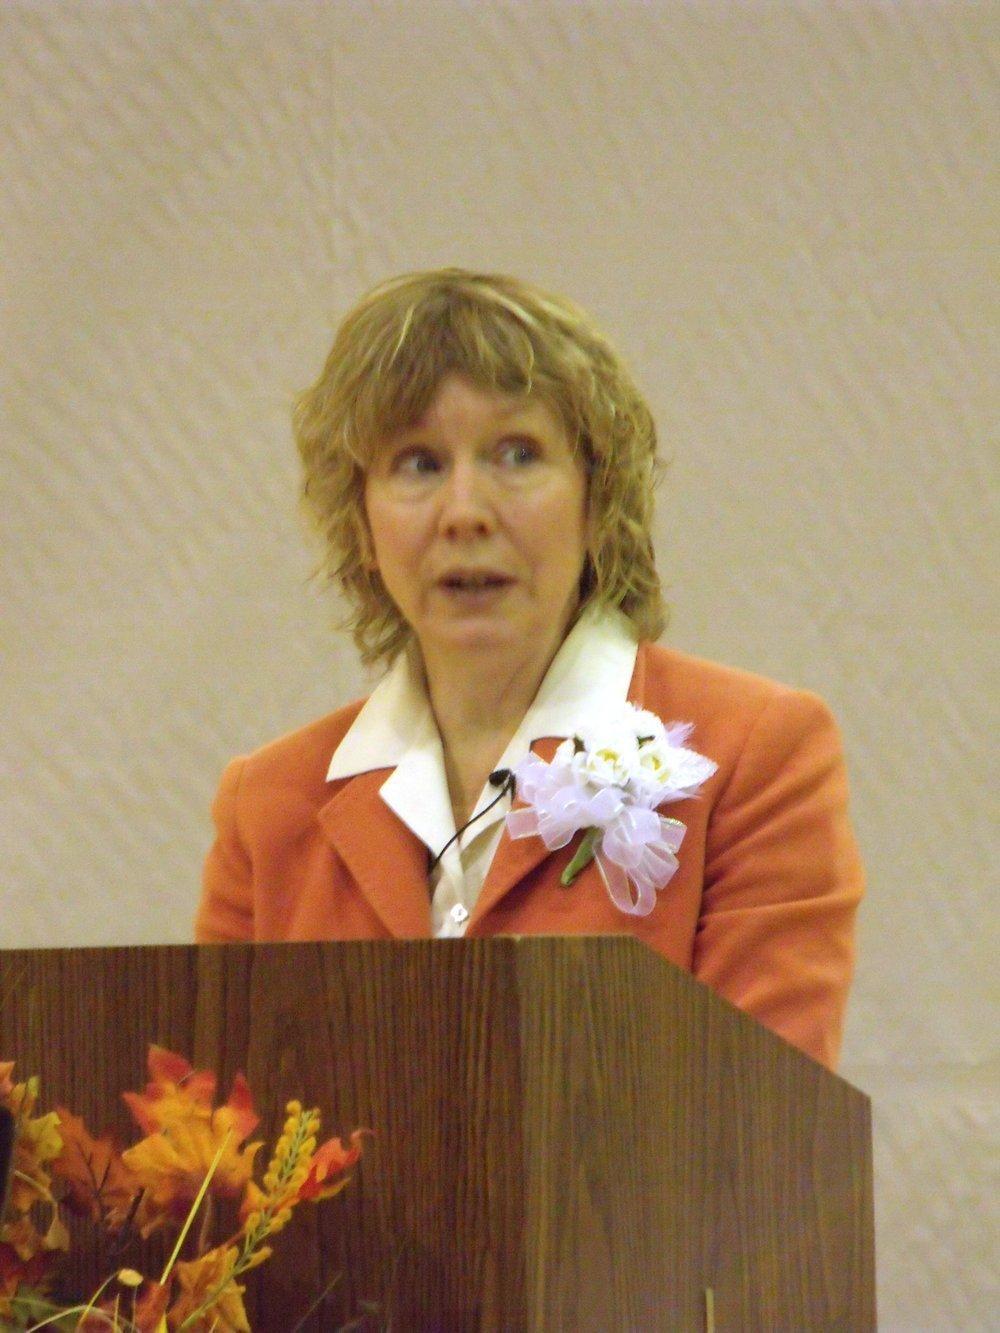 Gracia Burnham - Gracia Burnham speaking.